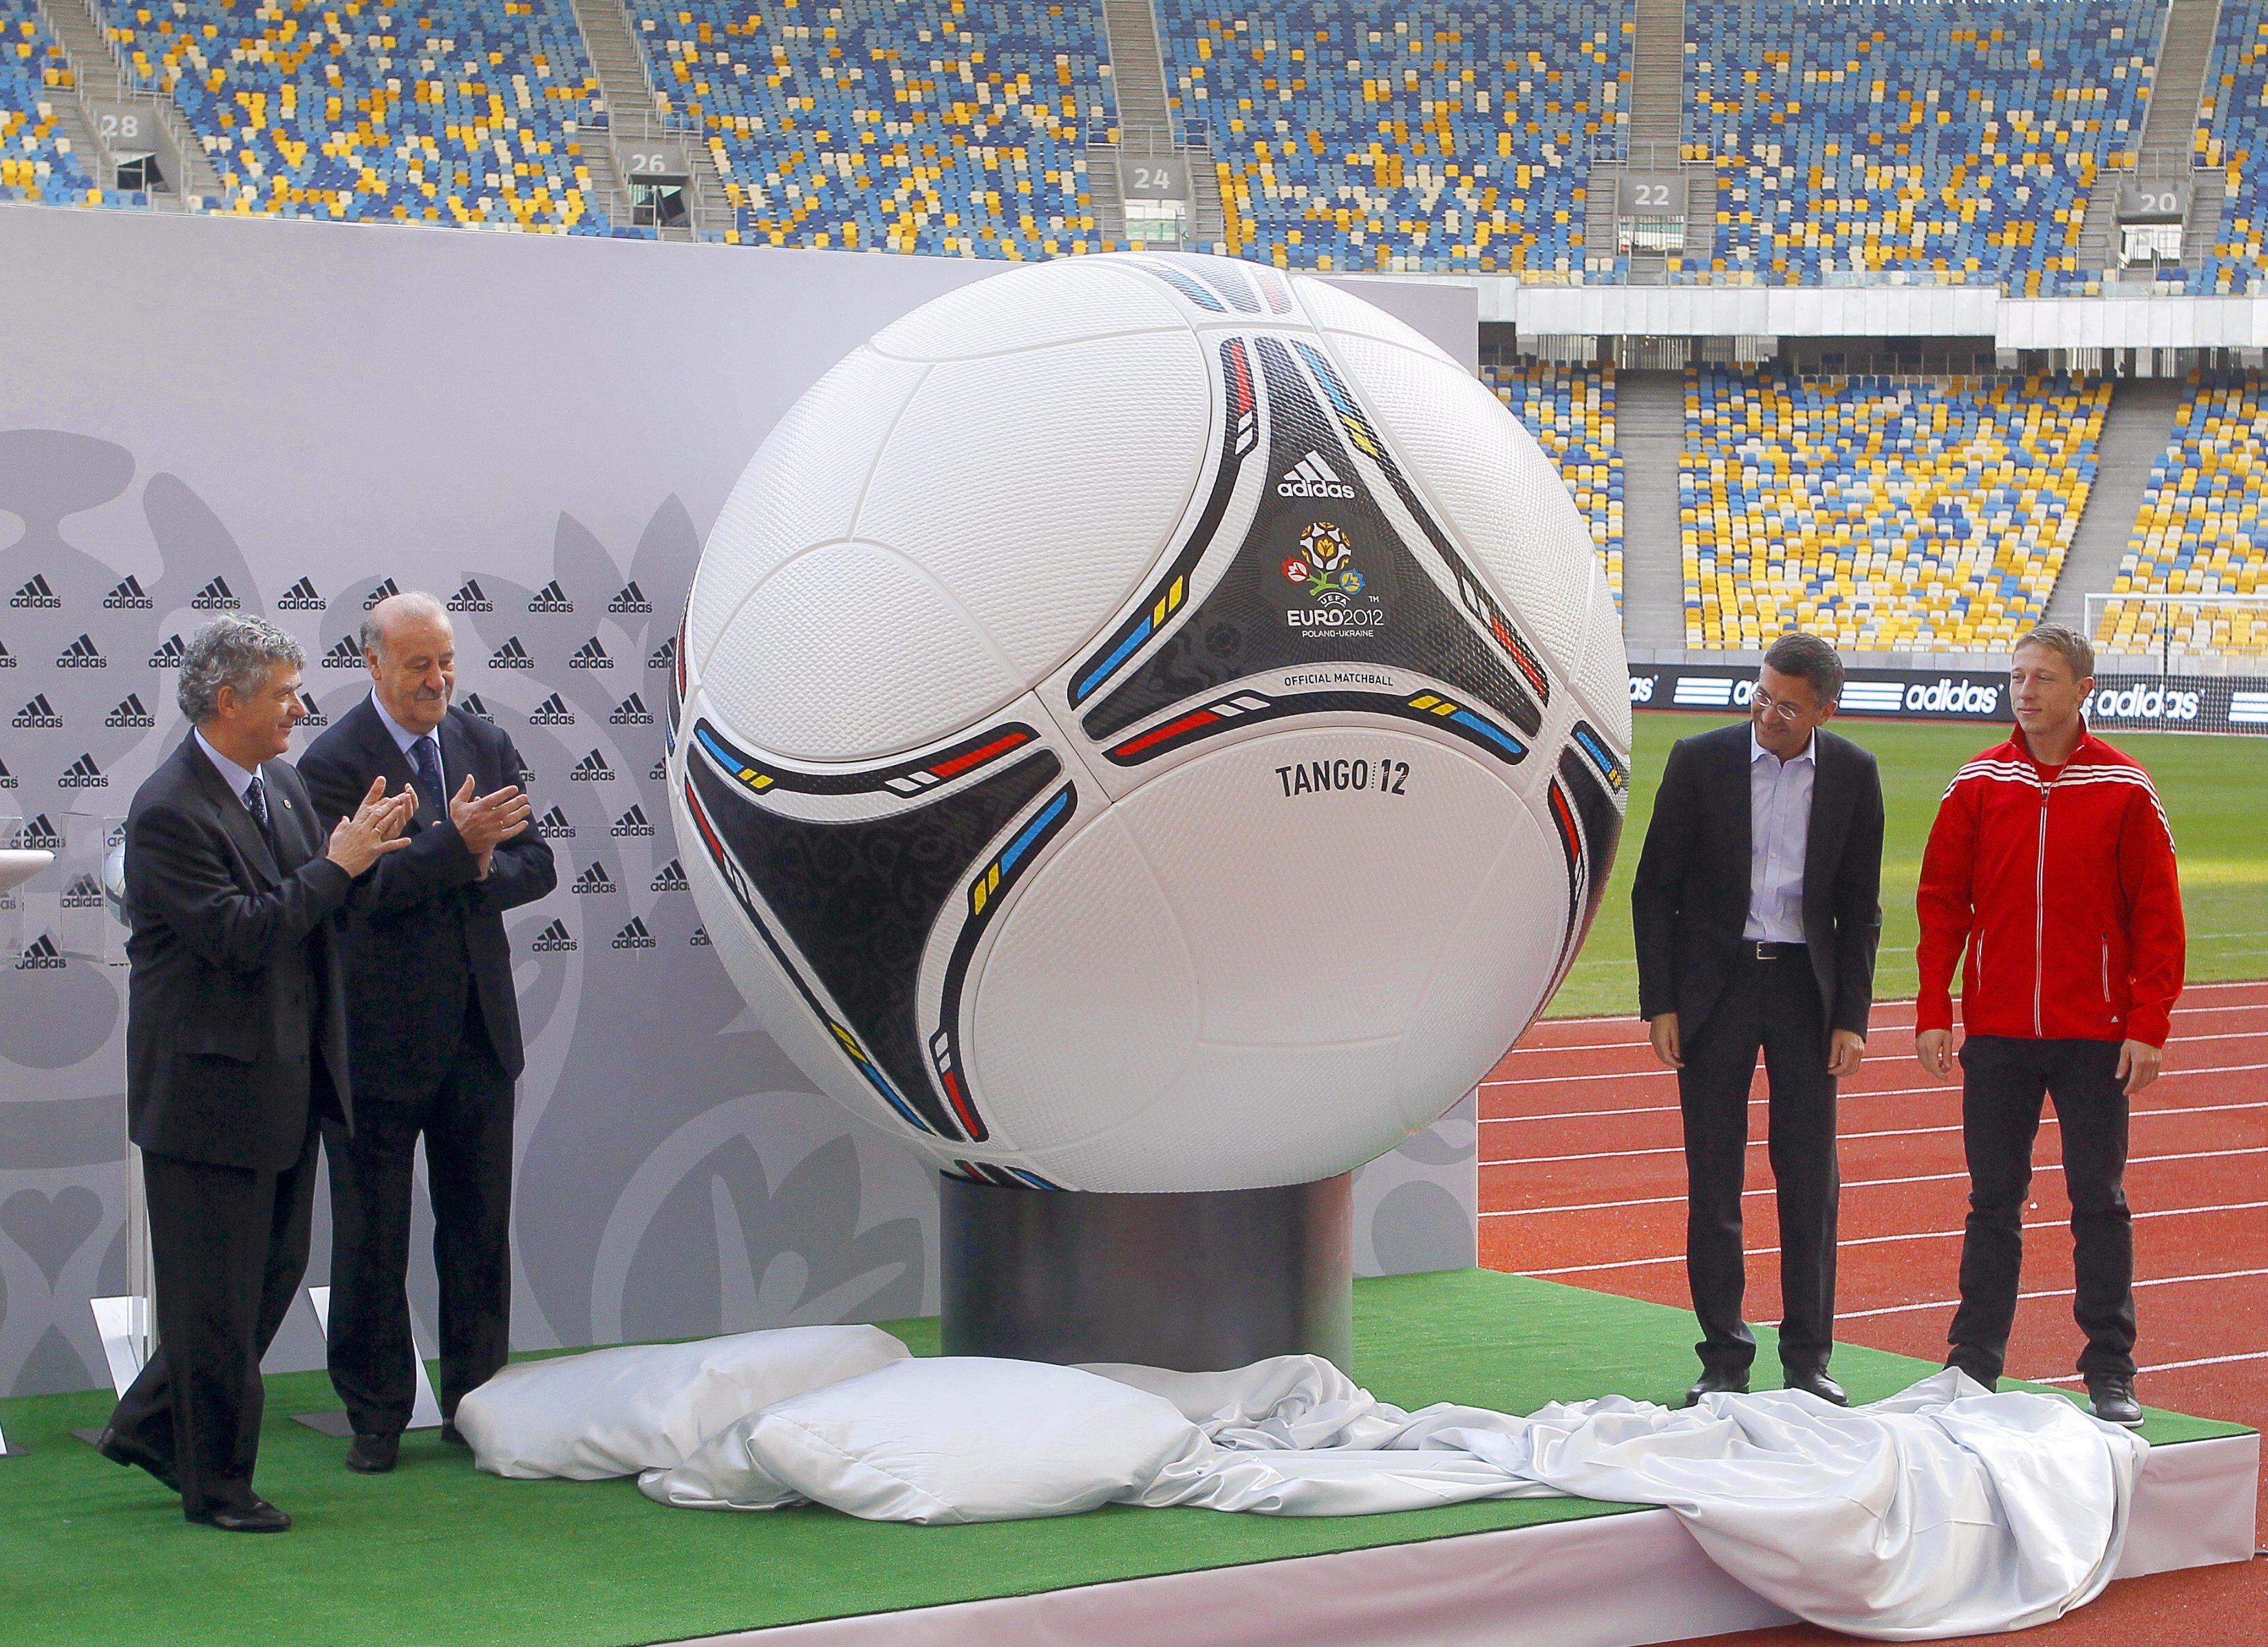 Представиха официалната топка за Евро 2012